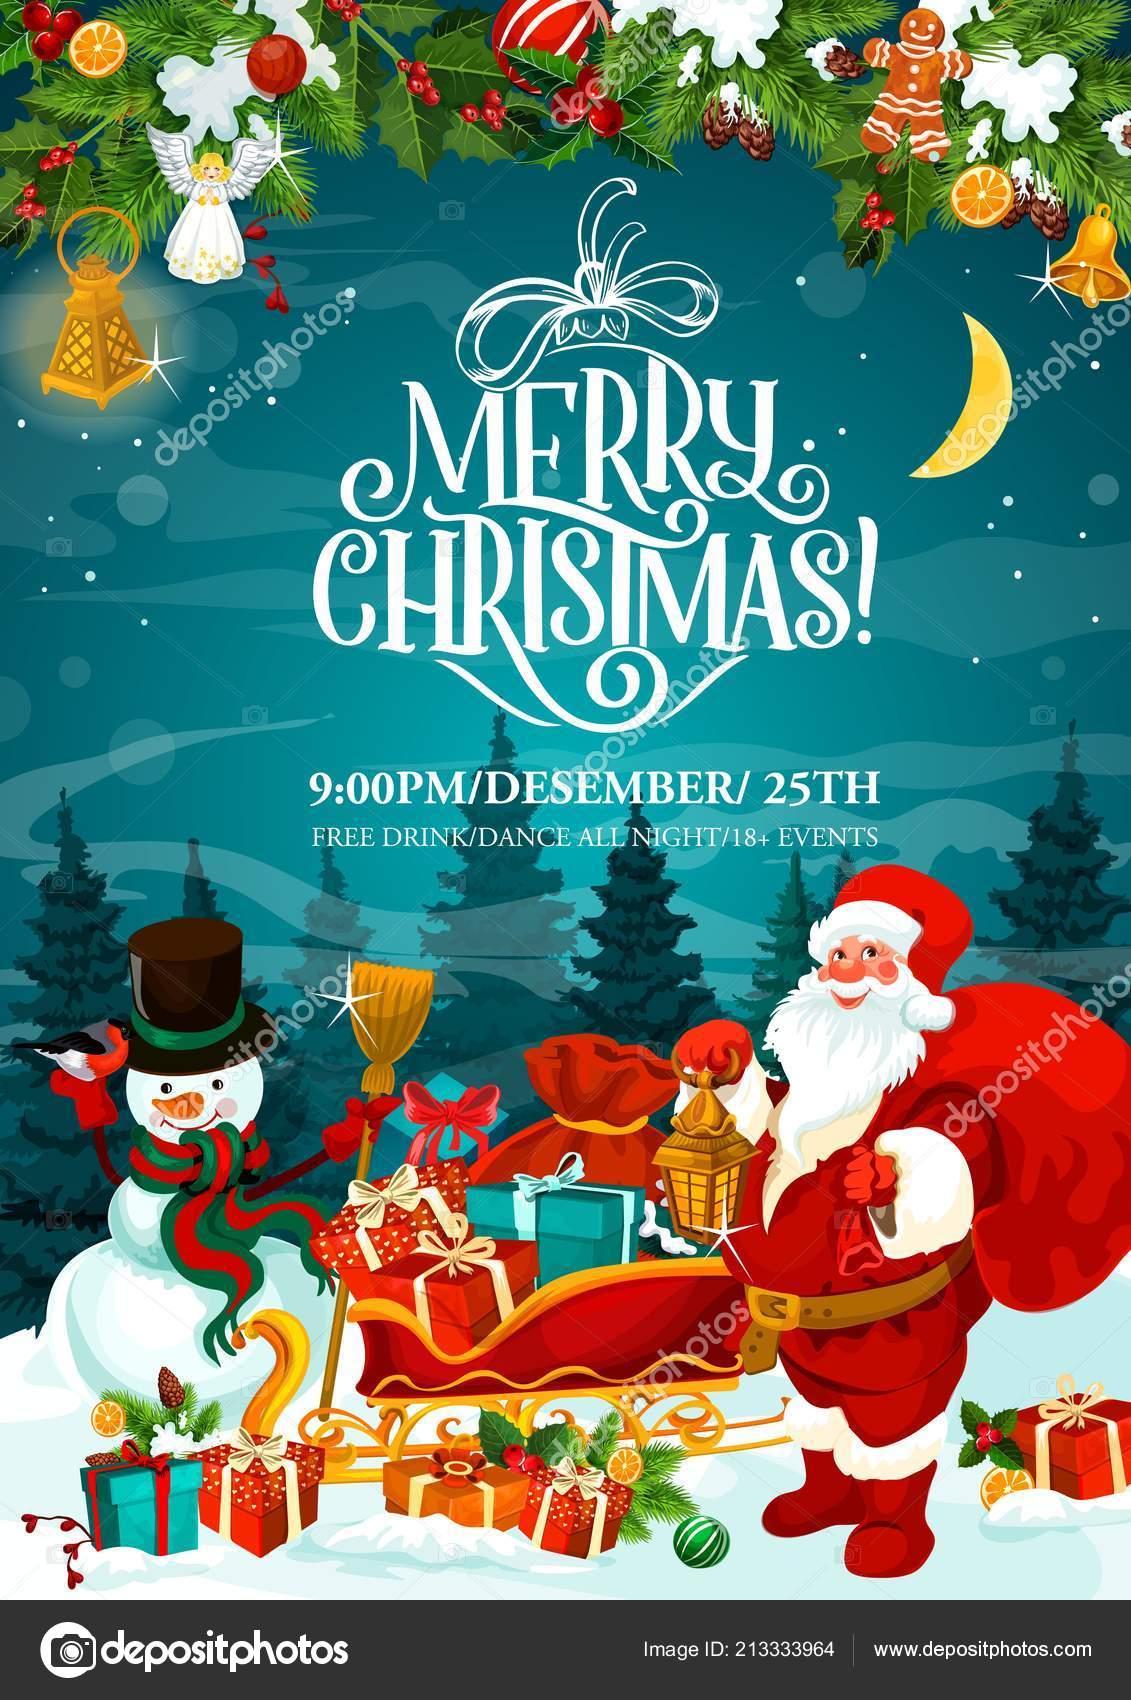 Merry Christmas Santa Party Invitation Card Stock Vector